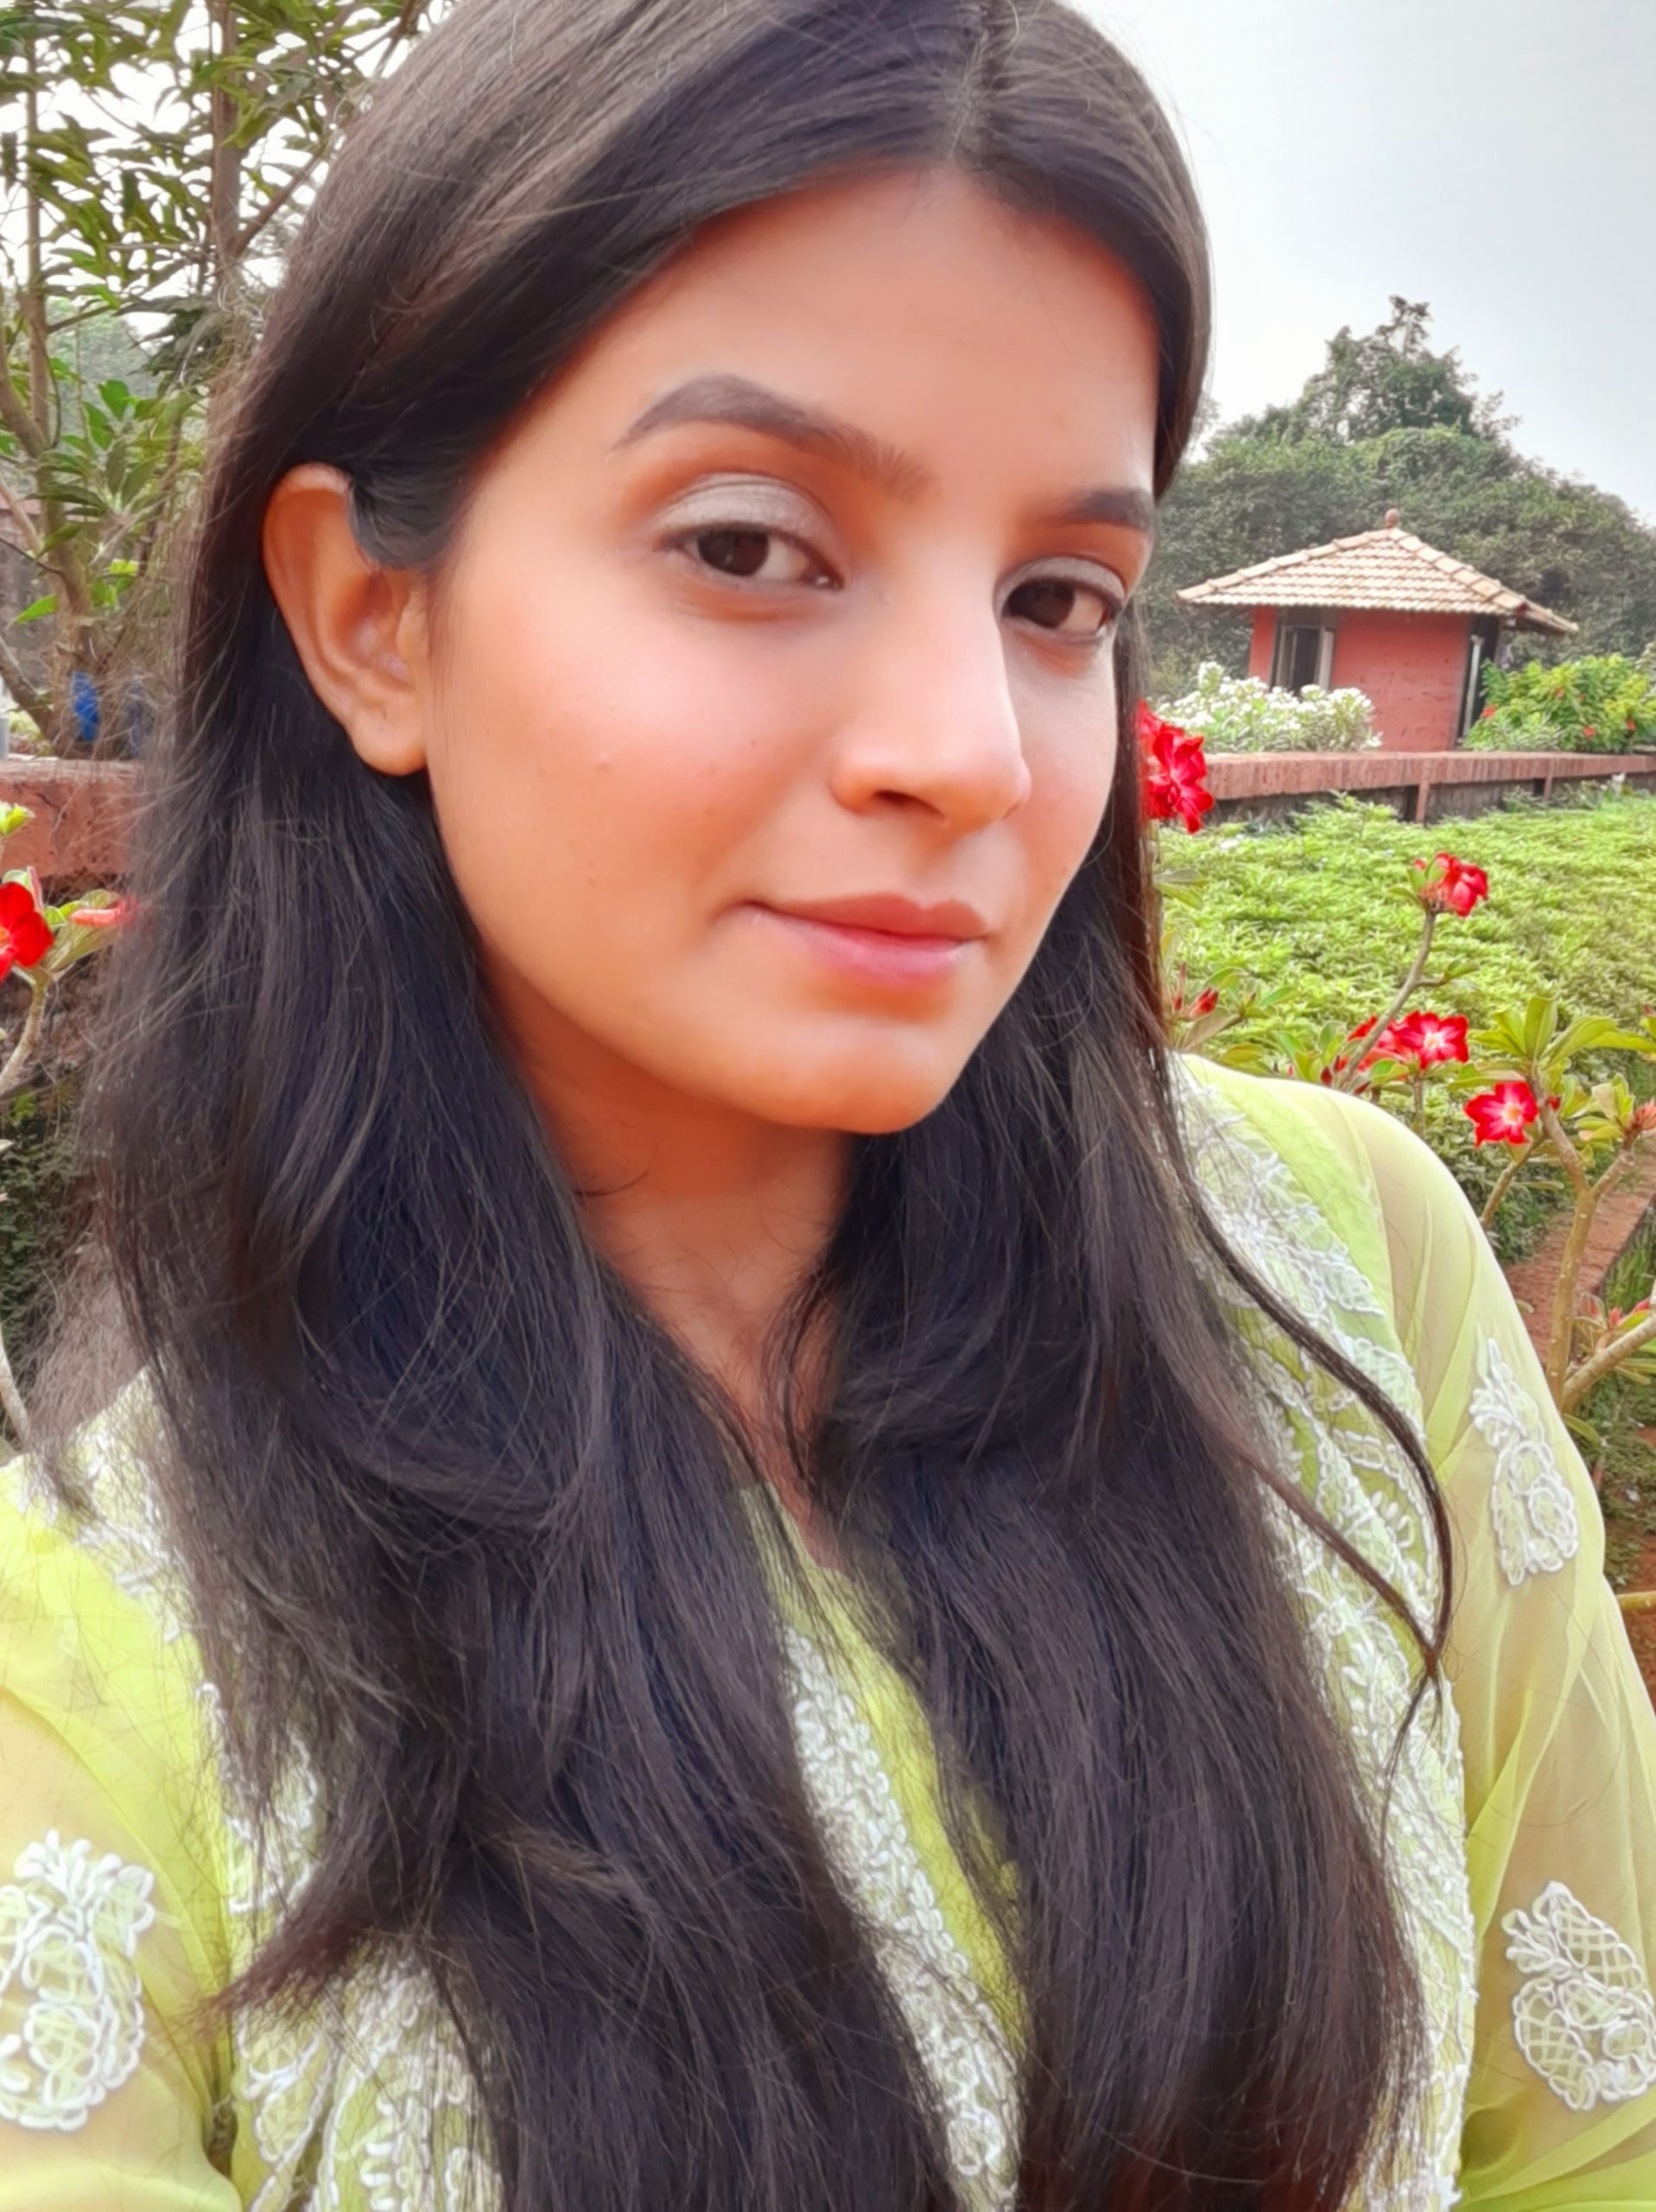 Sri Lankan Actresses: Manjula Kumari Unseen Hot Images 3